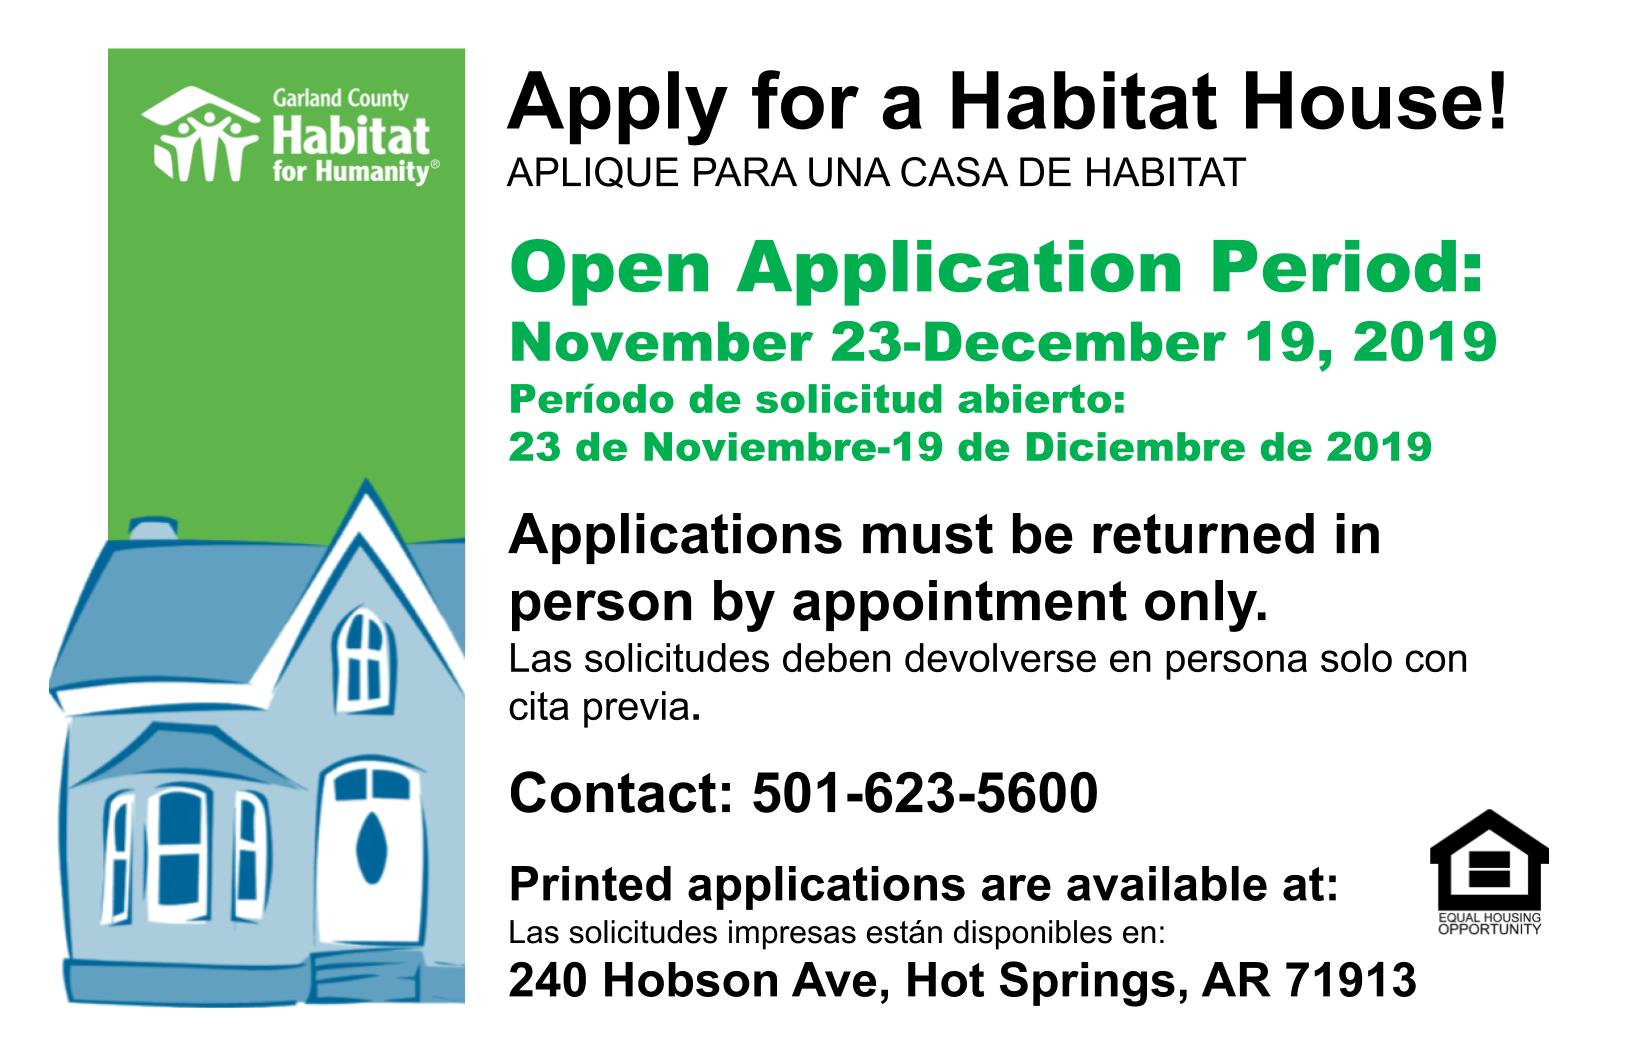 Apply for a Habitat House